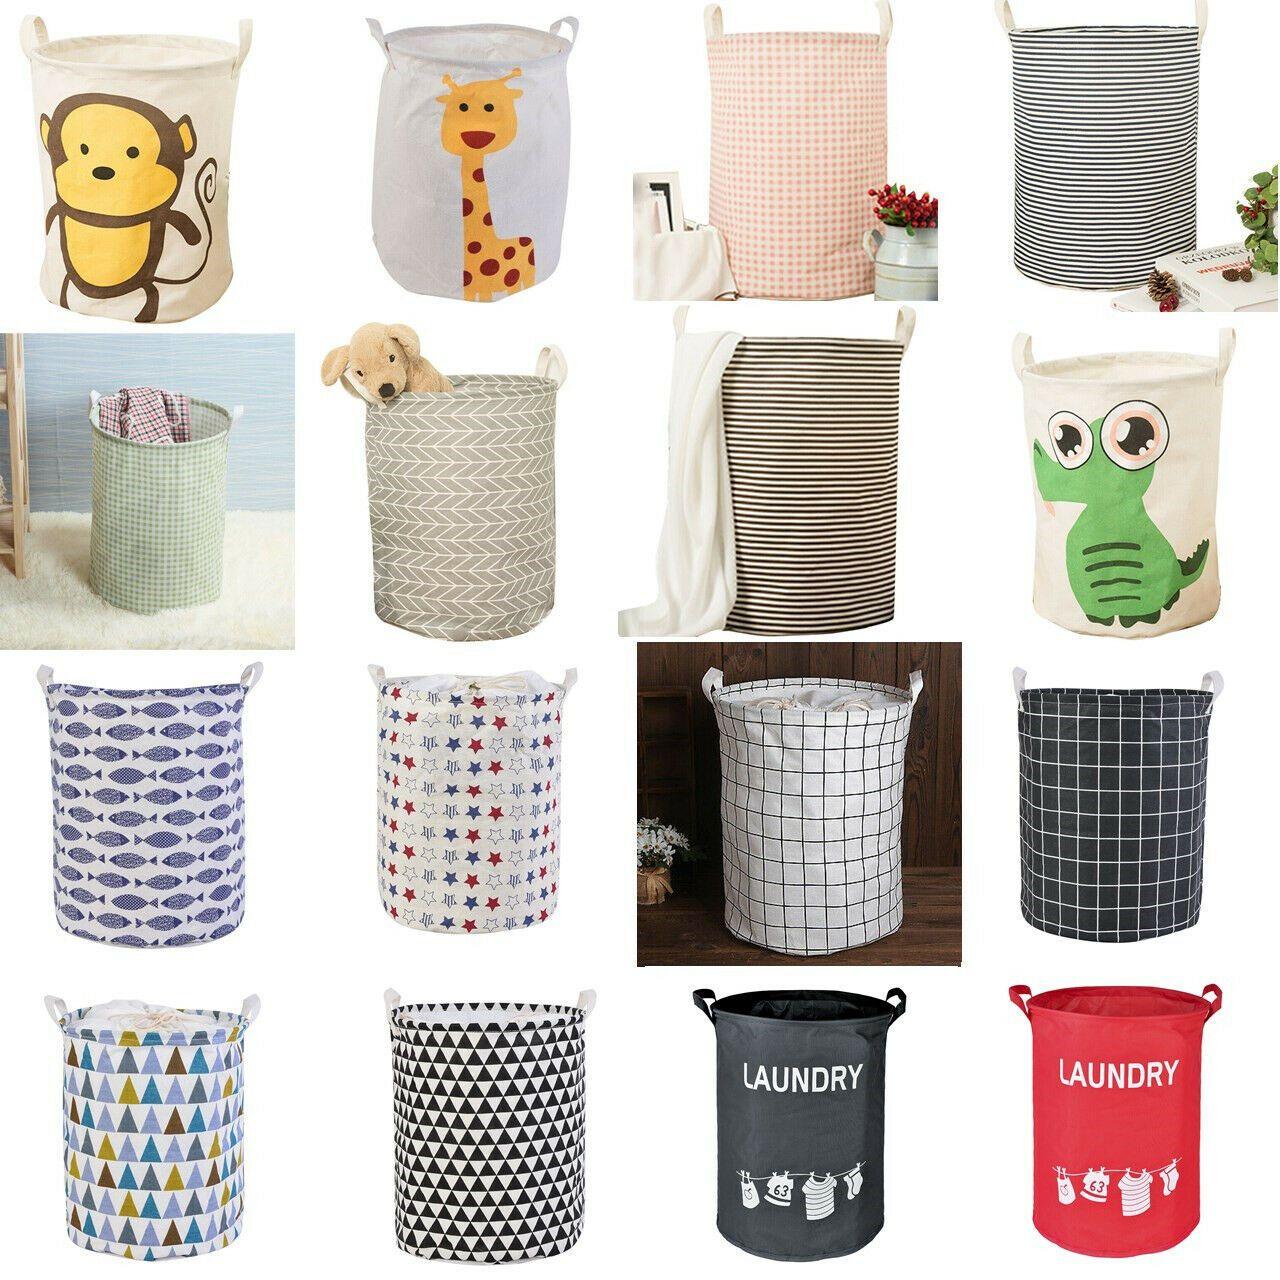 Usa Laundry Basket Bag Foldable Cloth Linen Washing Clothes Hamper